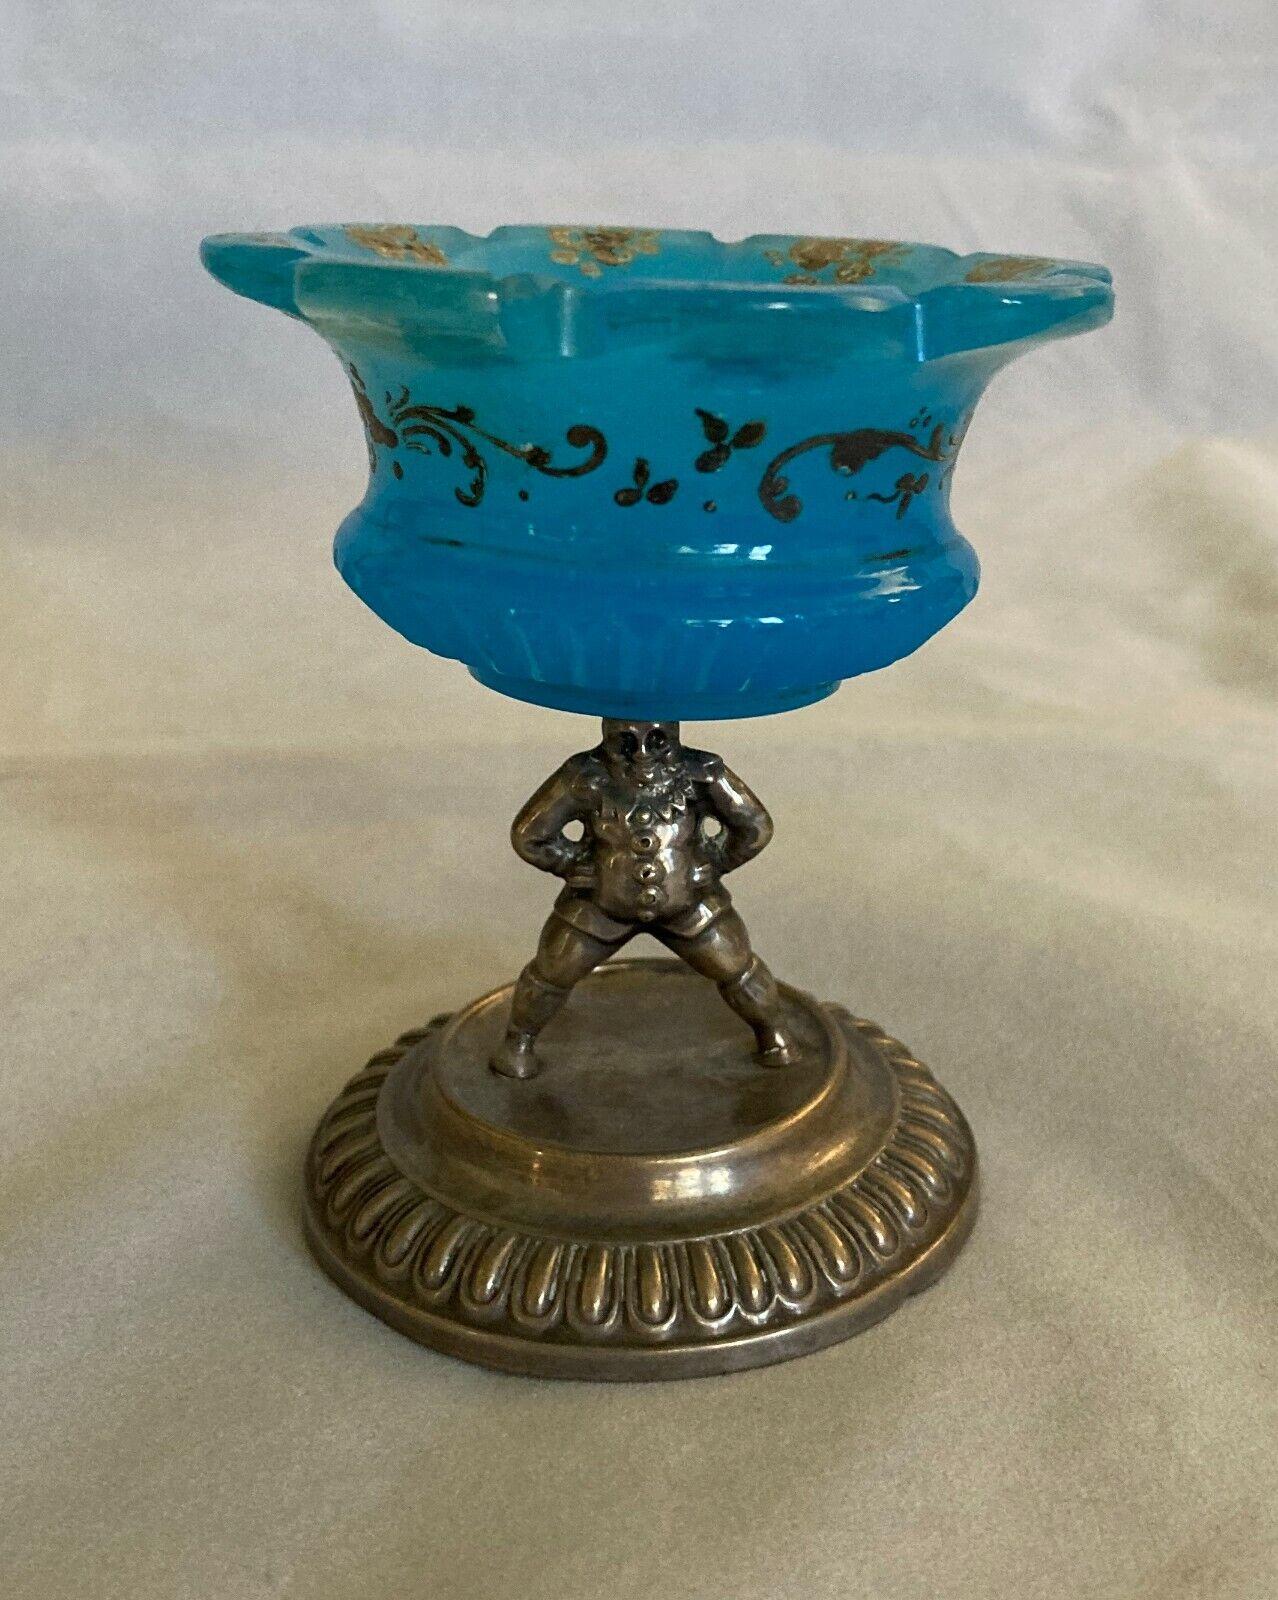 Antique Blue Opaline Glass Trinket Dish Figural Metal Pedestal AS IS 3 1/4  - $19.99